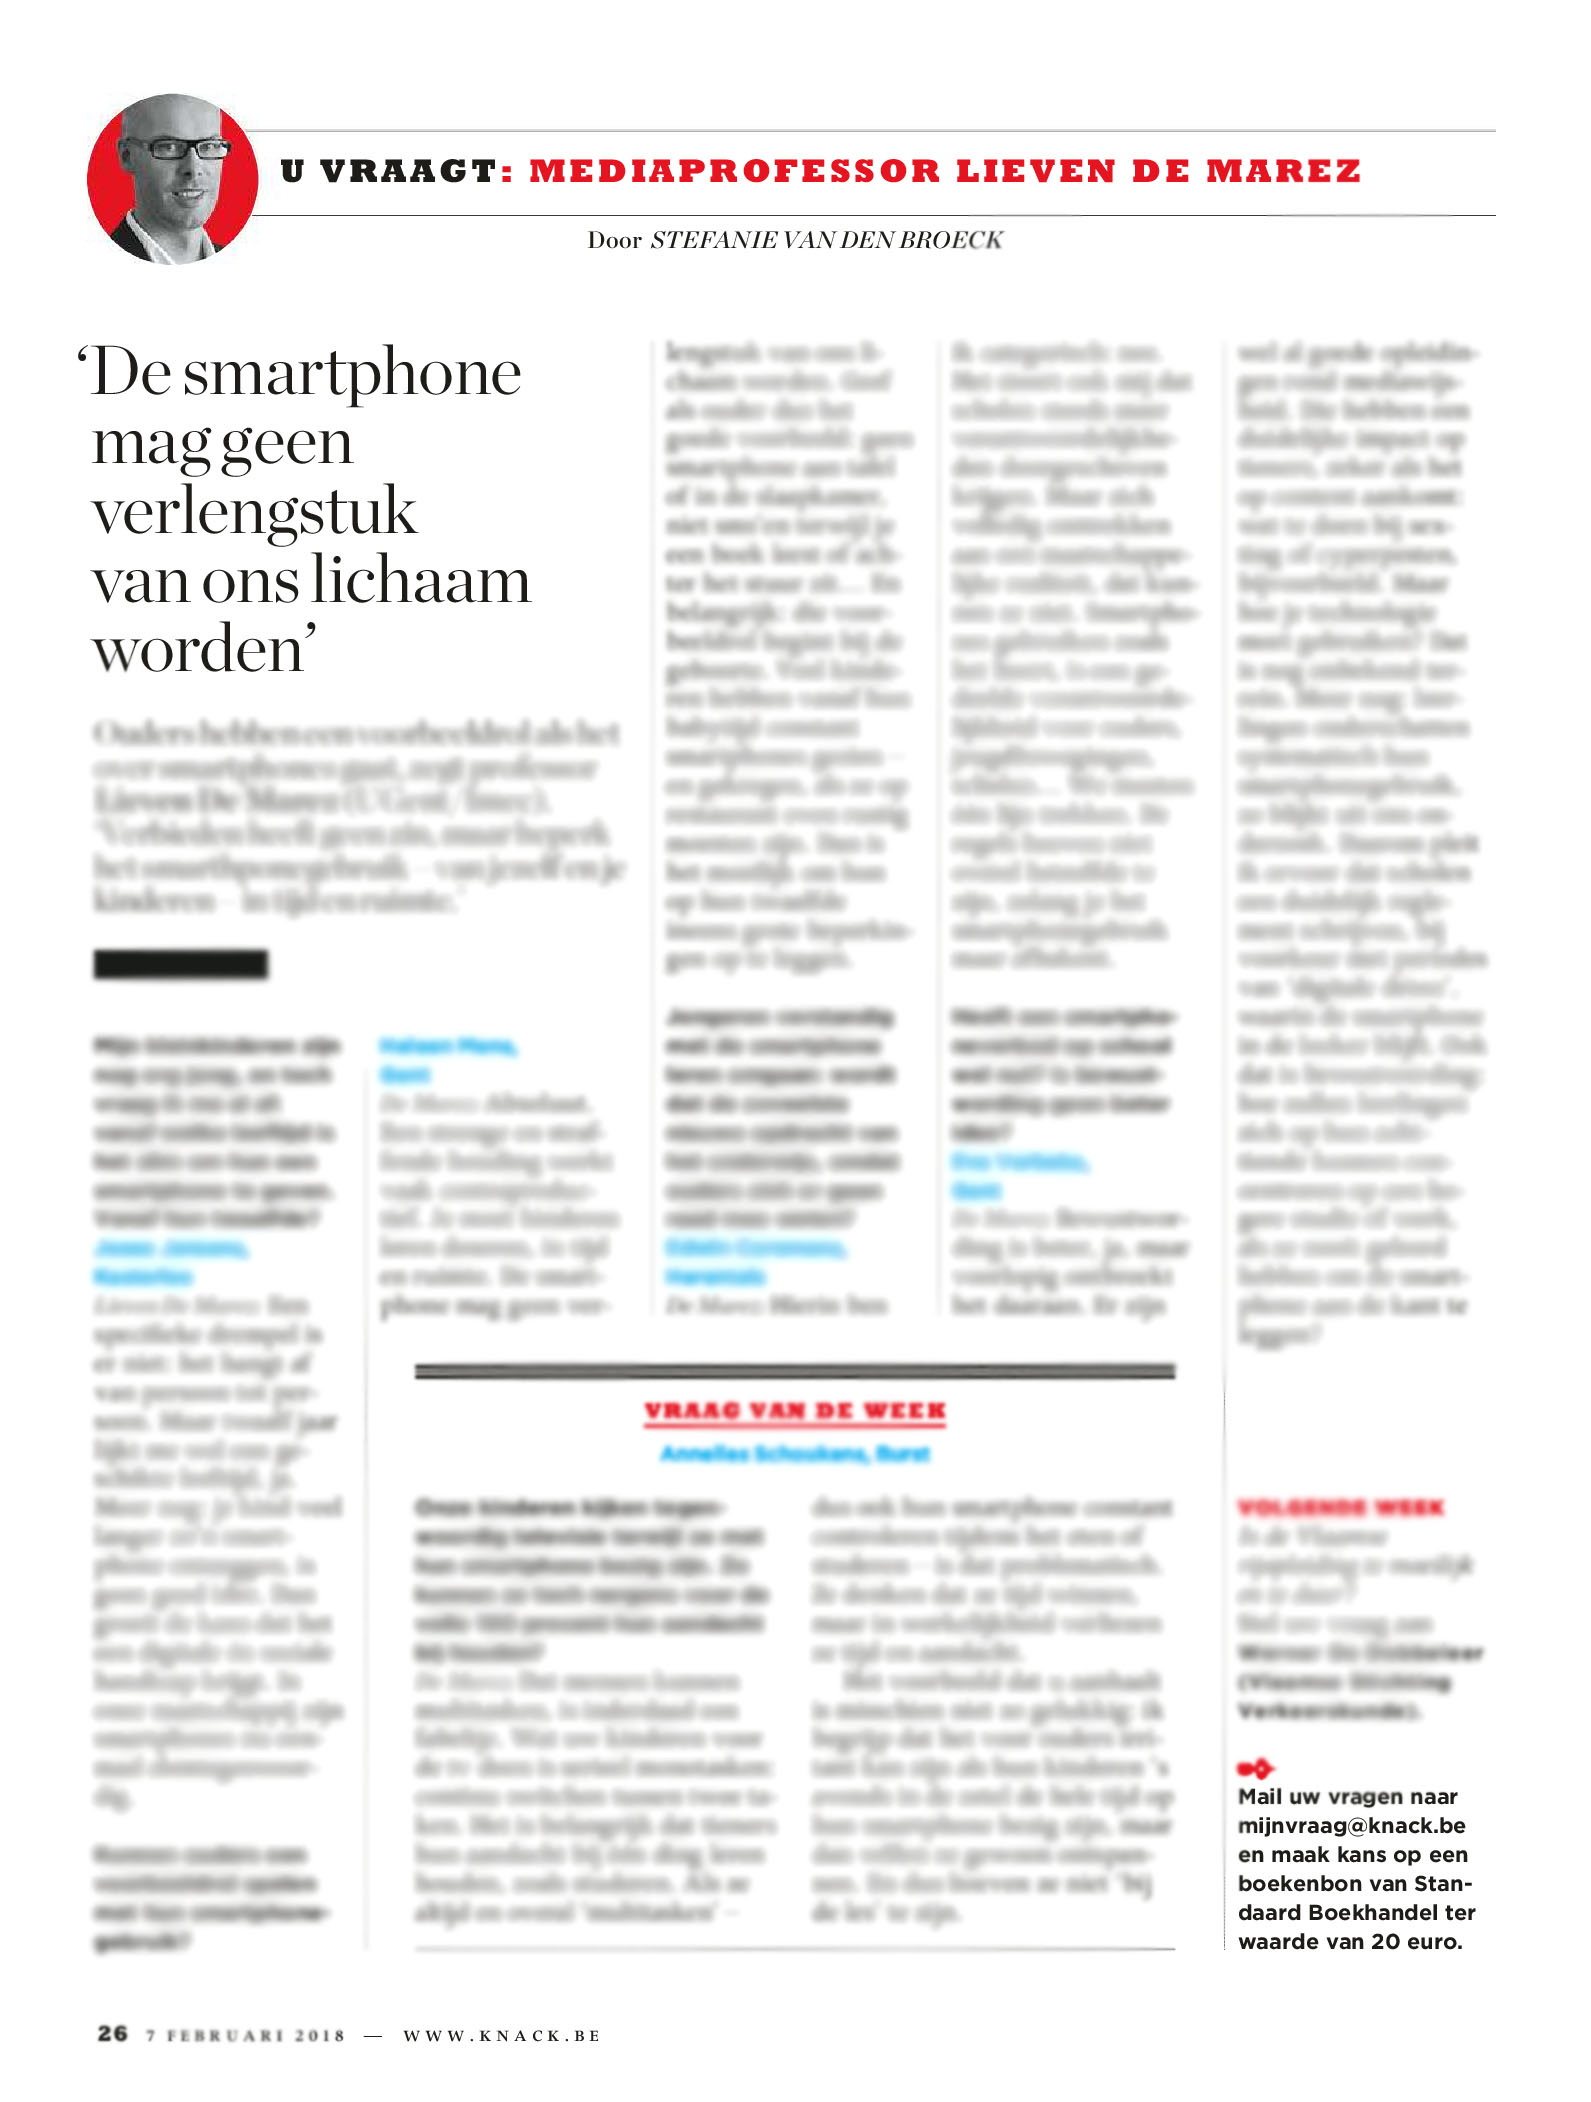 BRON: Knack, 7/02/2018, p 26